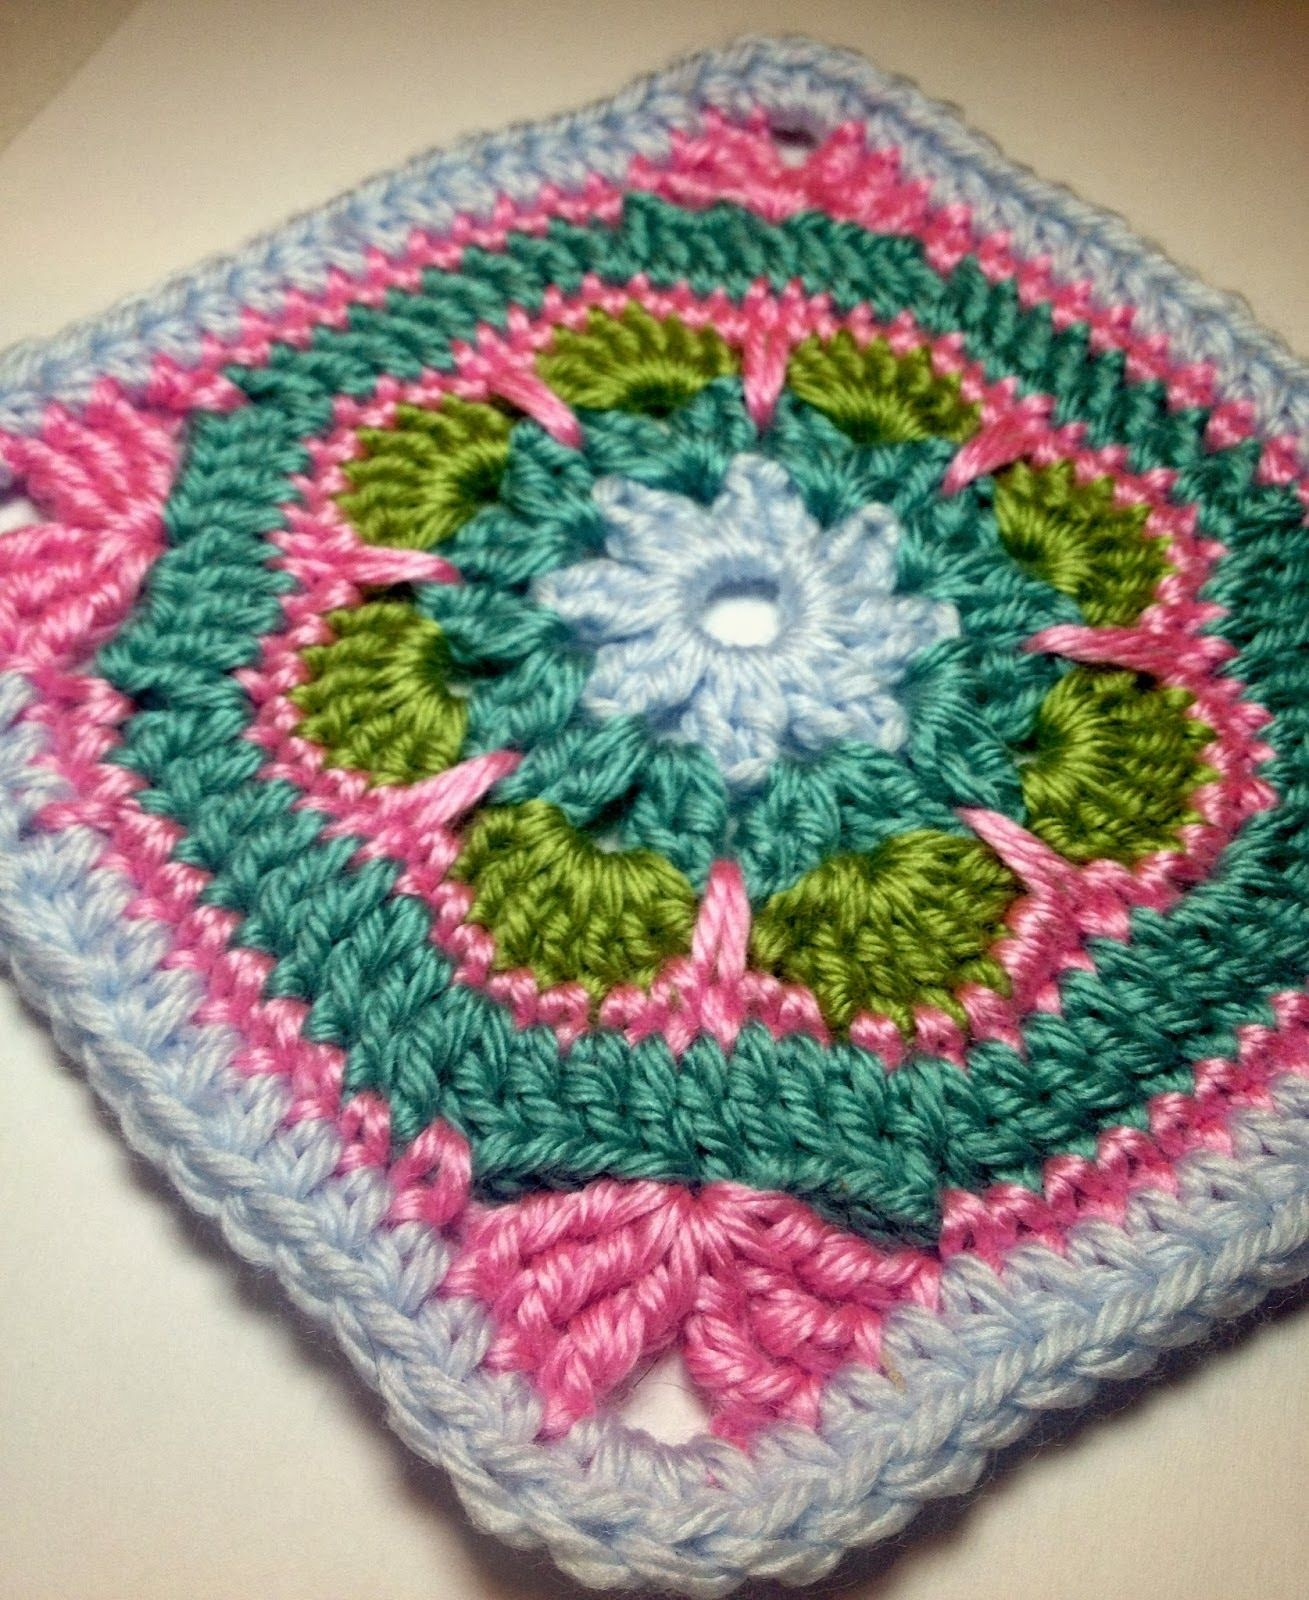 Free Crochet Patterns: Free Crochet Granny Square Motif Patterns - Free Printable Crochet Granny Square Patterns